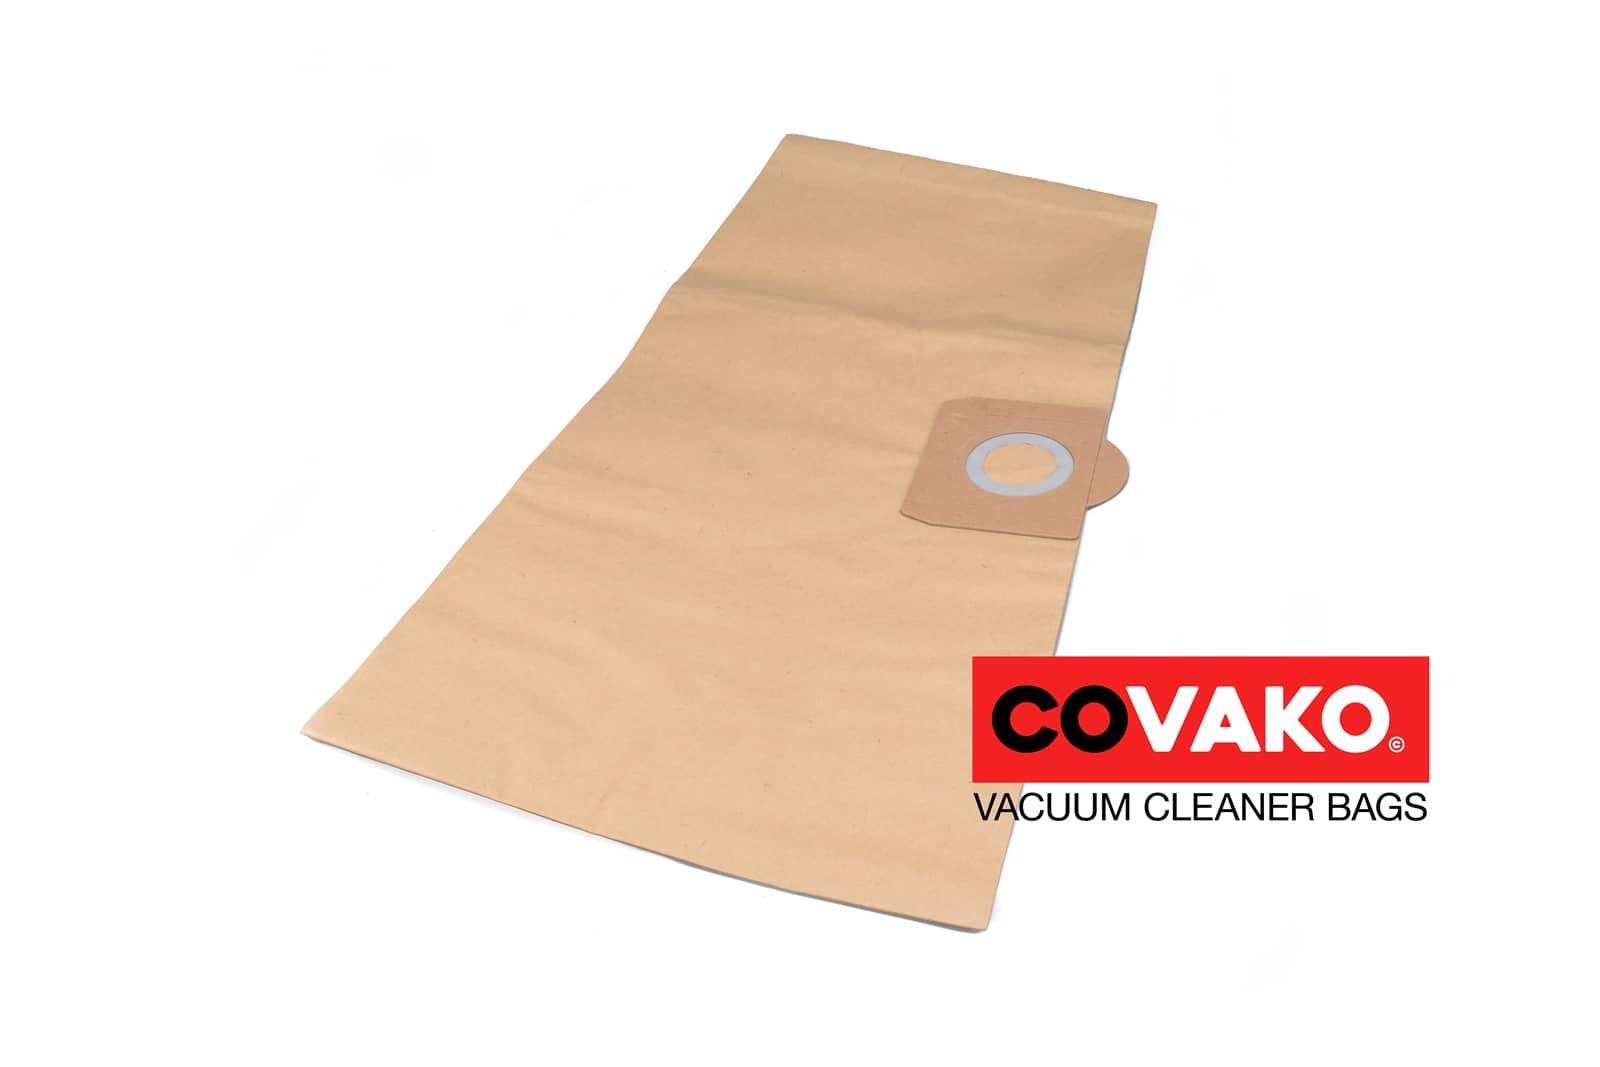 Soteco Dakota Compact 101 Spot / Papier - Soteco sacs d'aspirateur